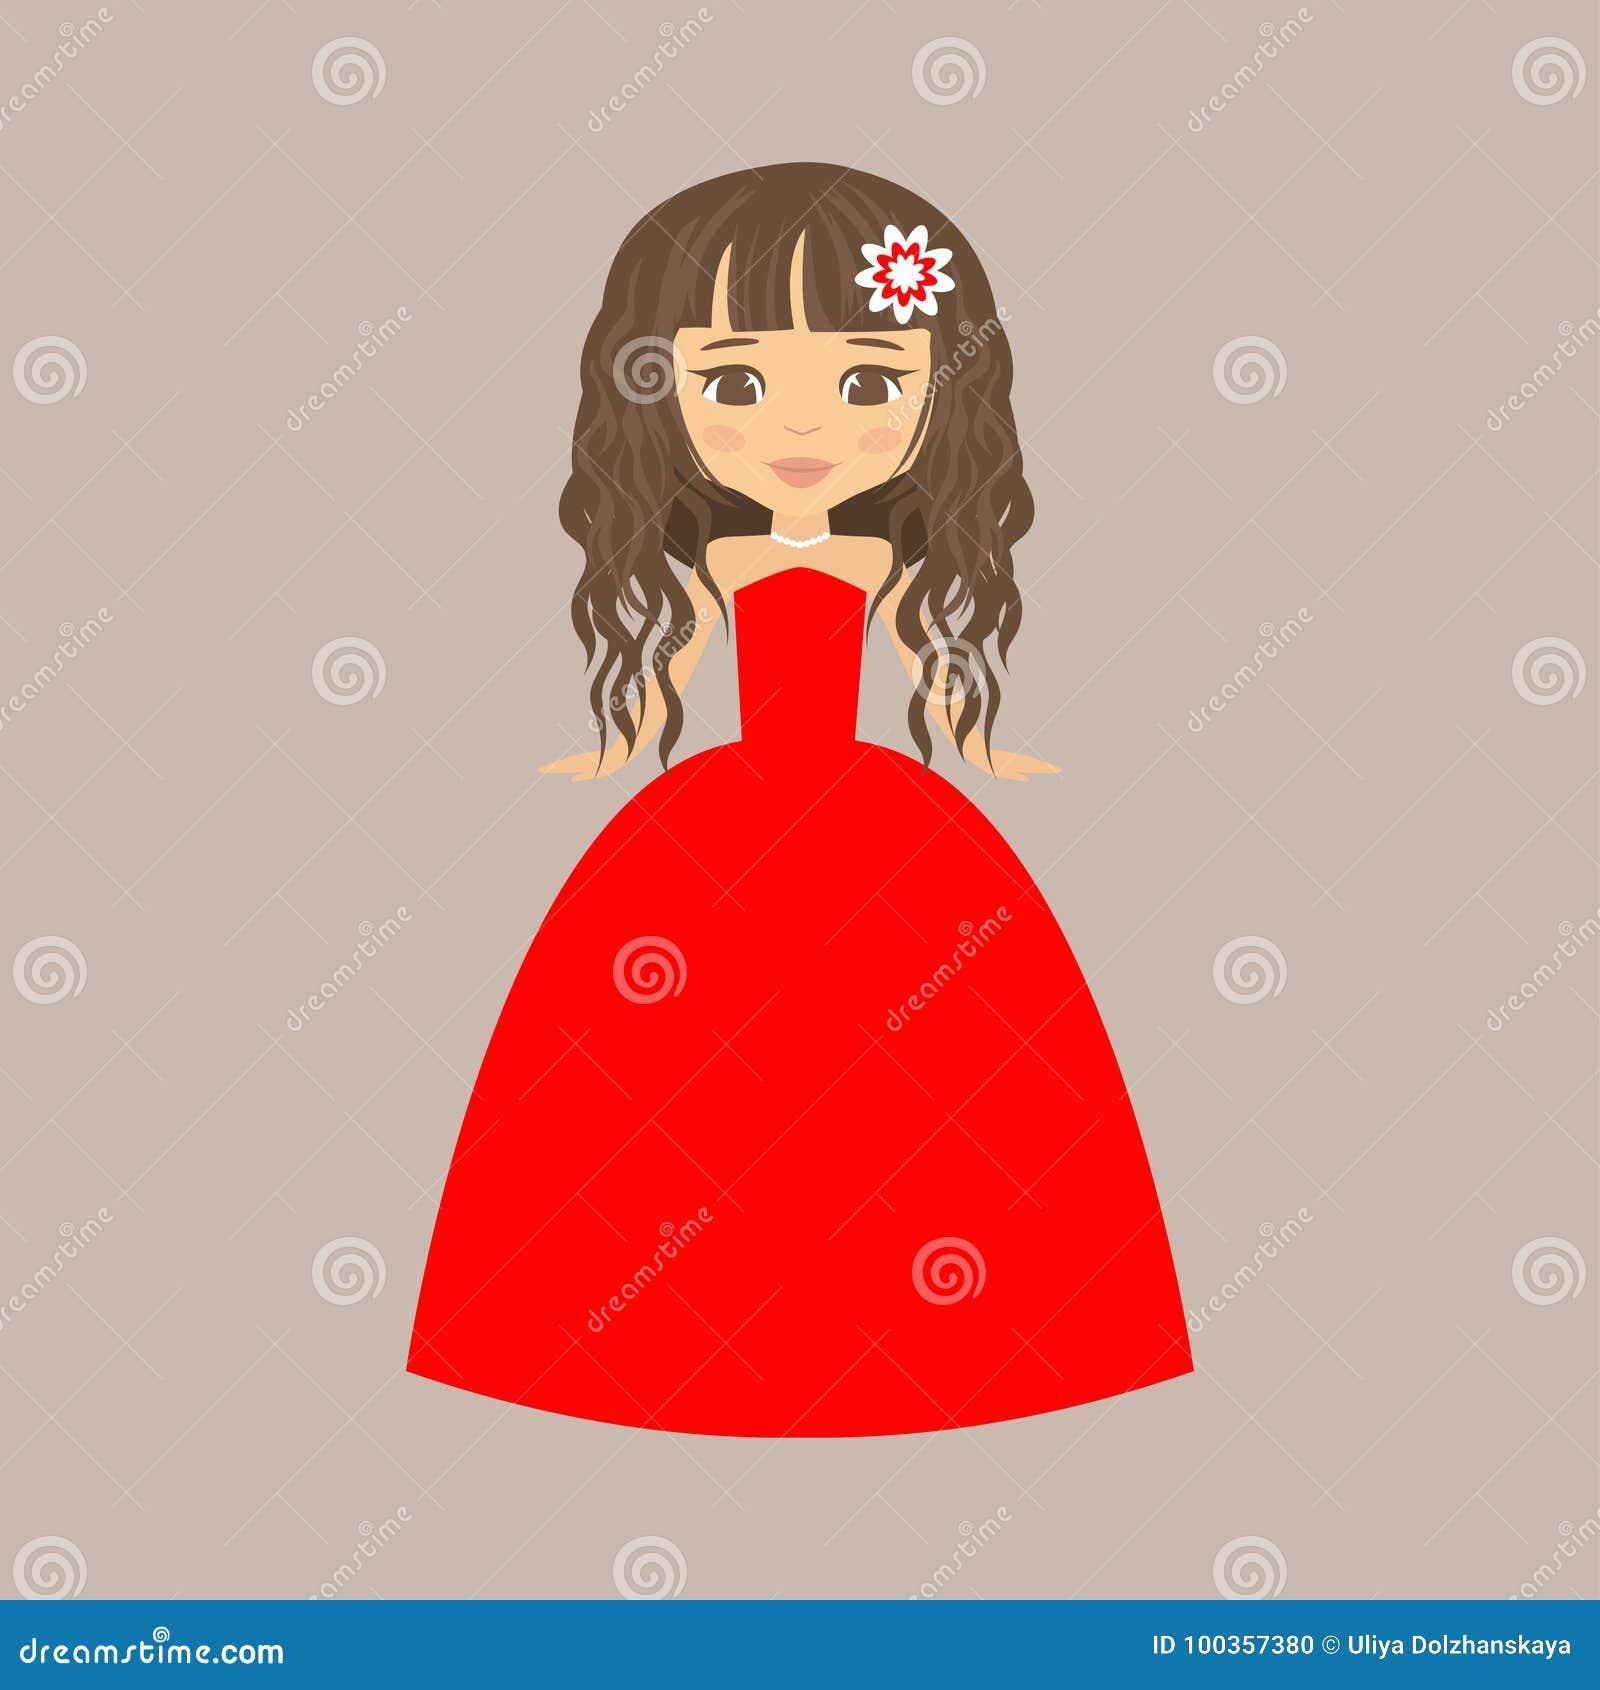 cartoon girl curly hair stock illustrations 1 960 cartoon girl rh dreamstime com cartoon picture of girl with curly hair cartoon picture of girl with curly hair